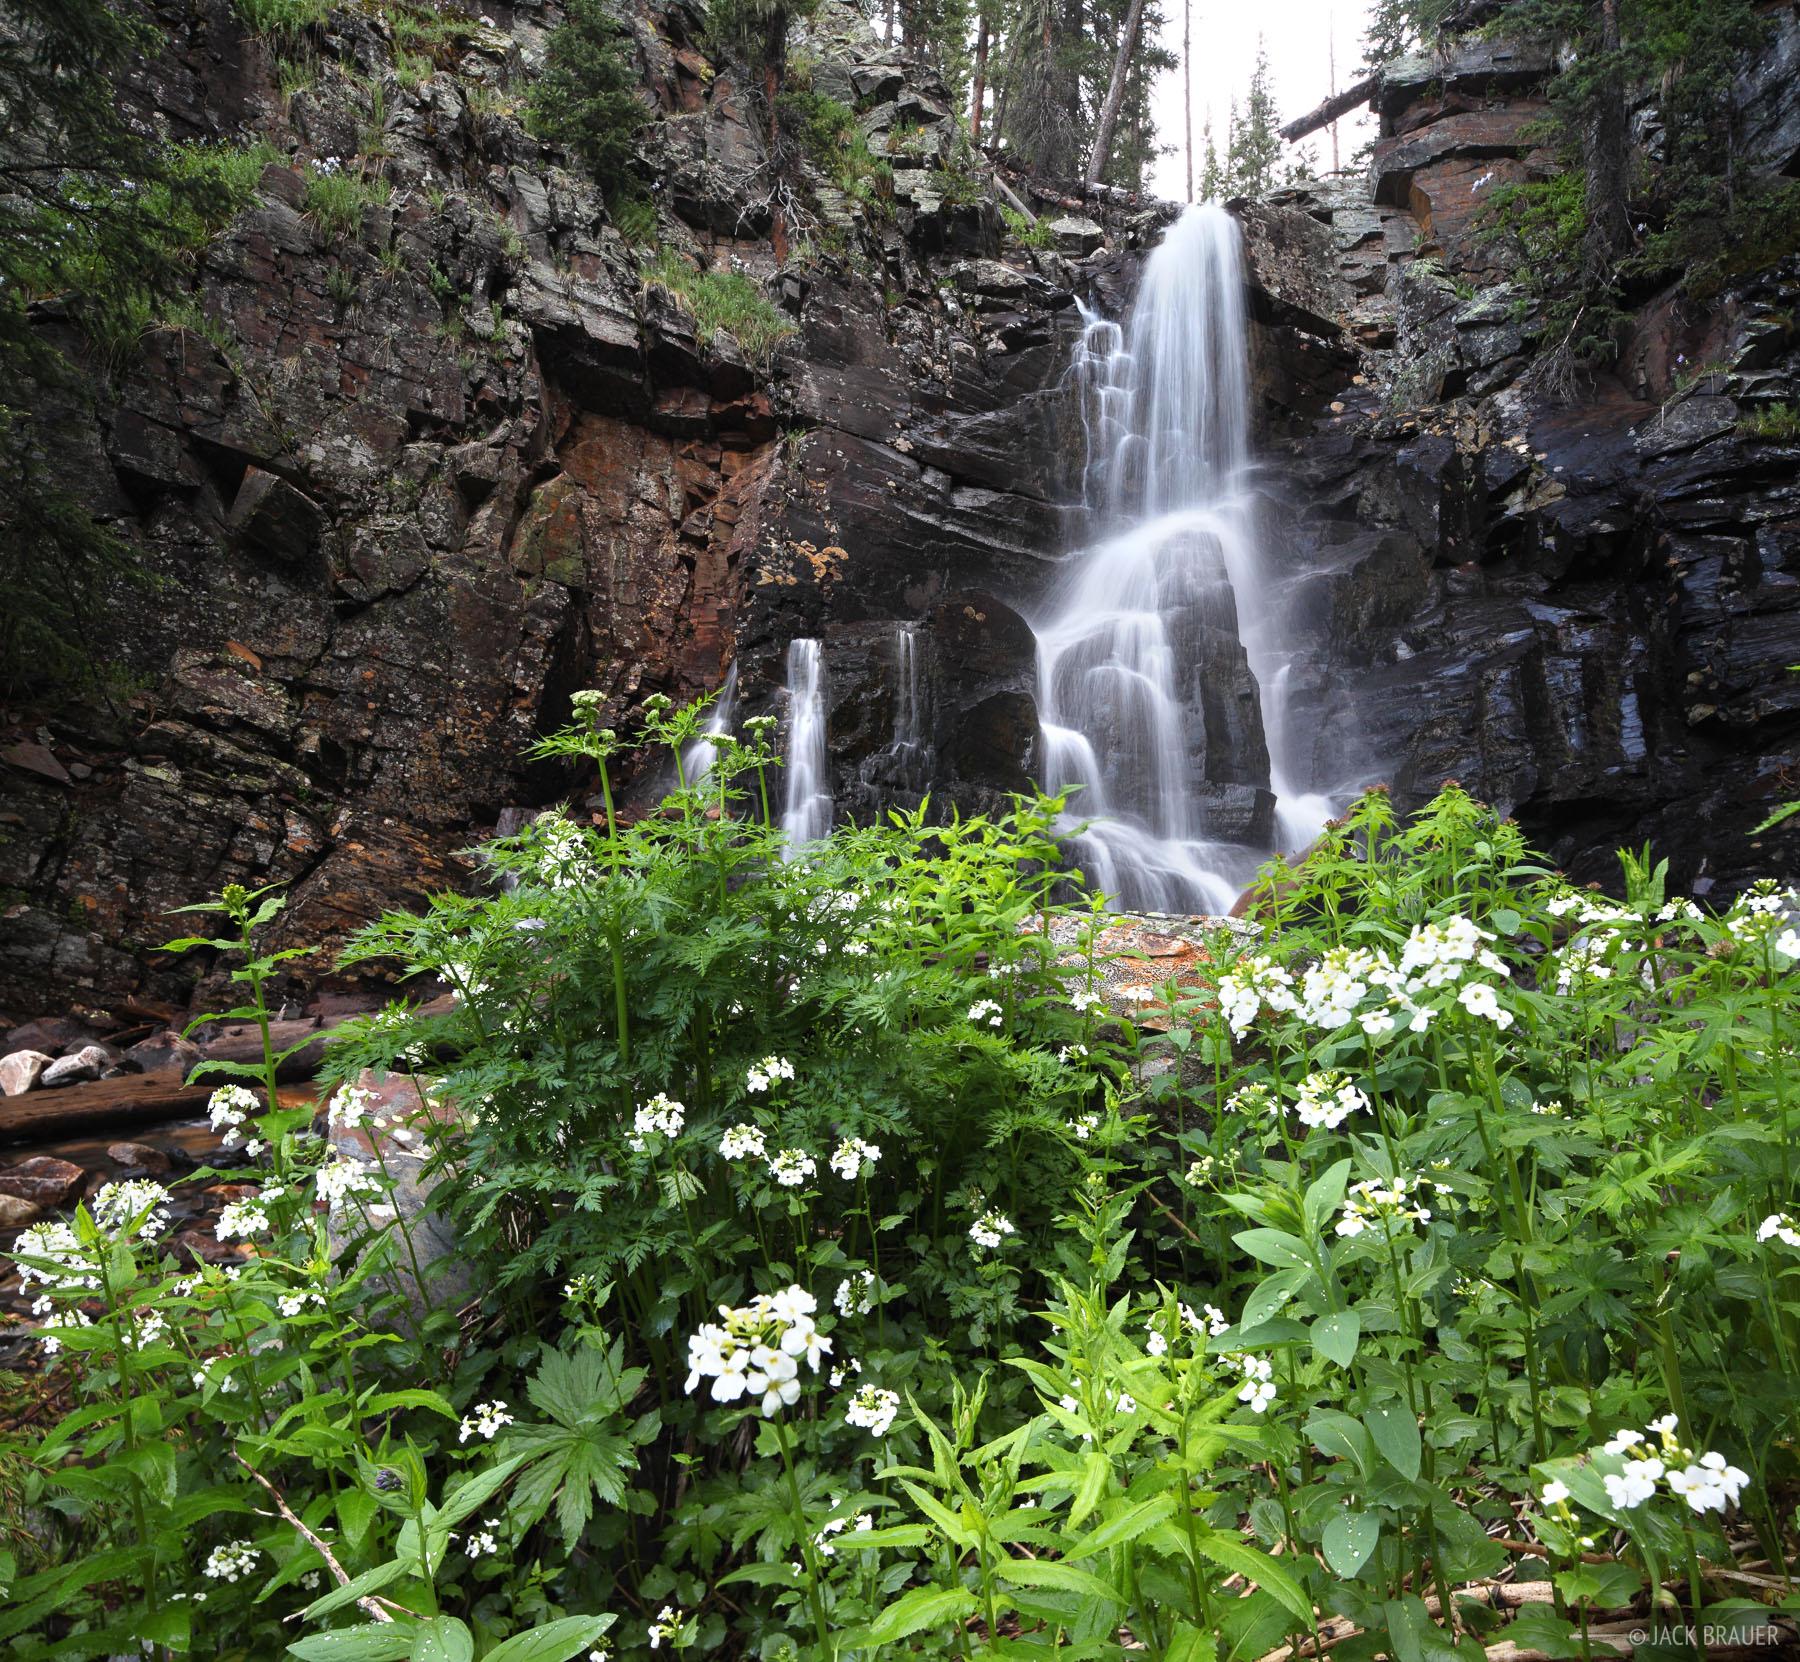 Vallecito Creek, waterfall, Weminuche Wilderness, Colorado, photo